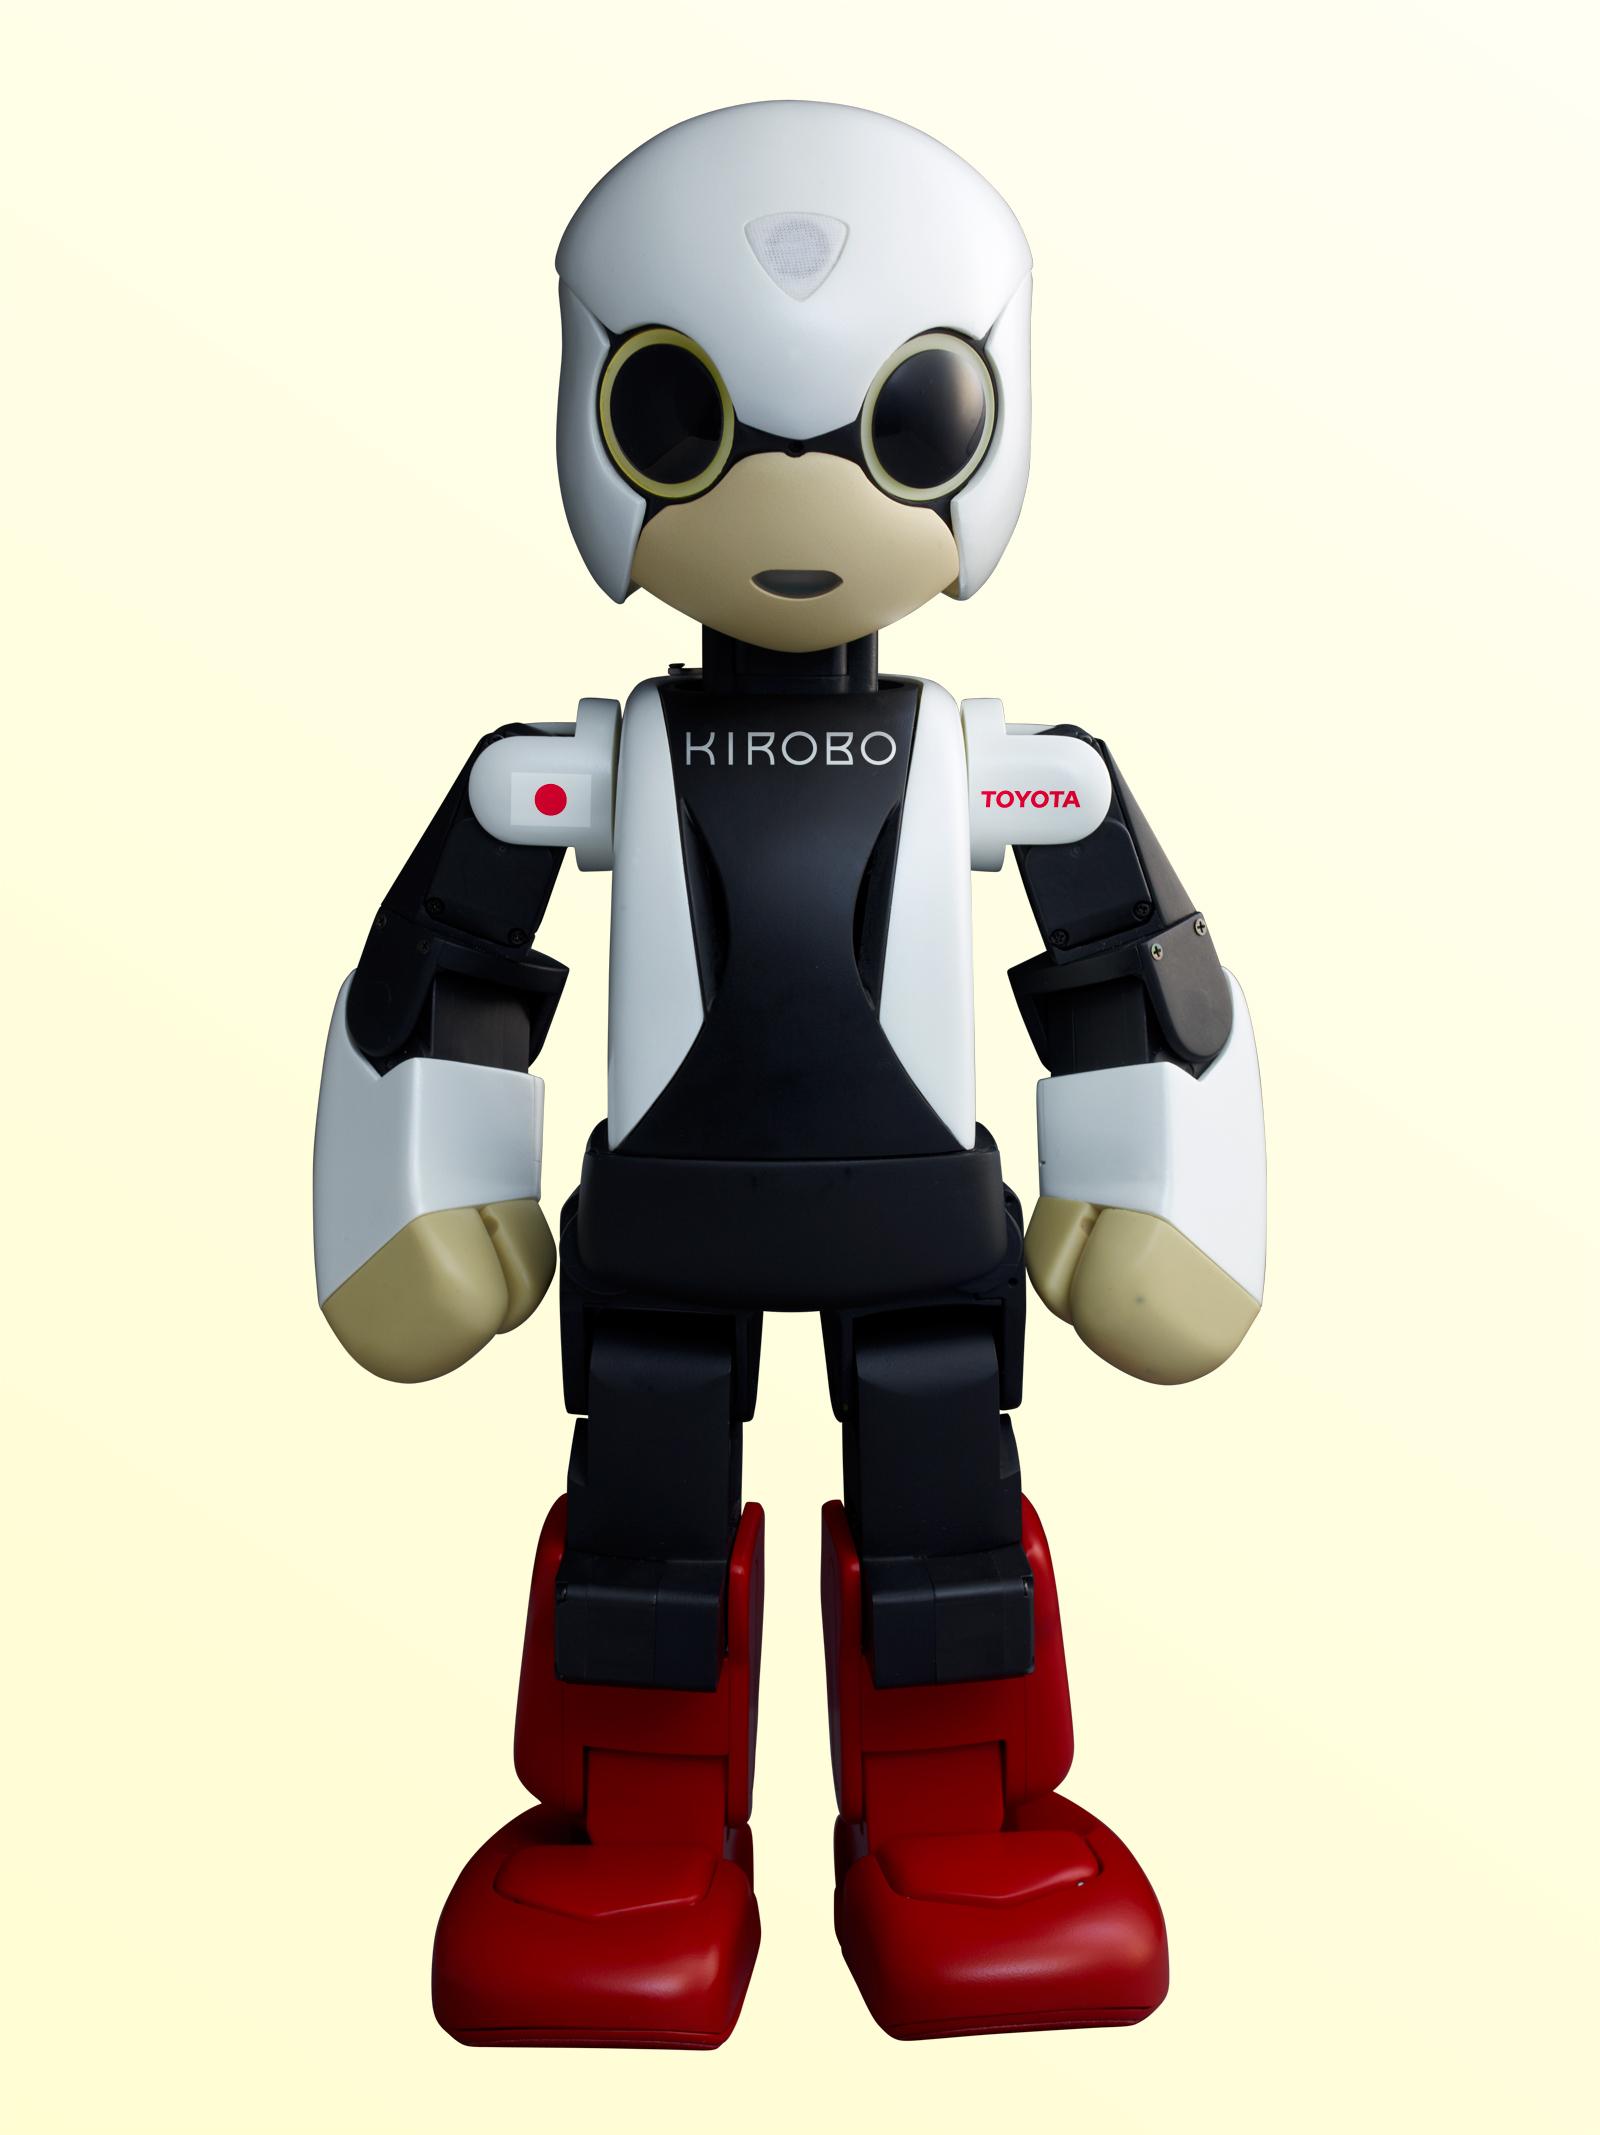 Kirobo, Robot Astronaut